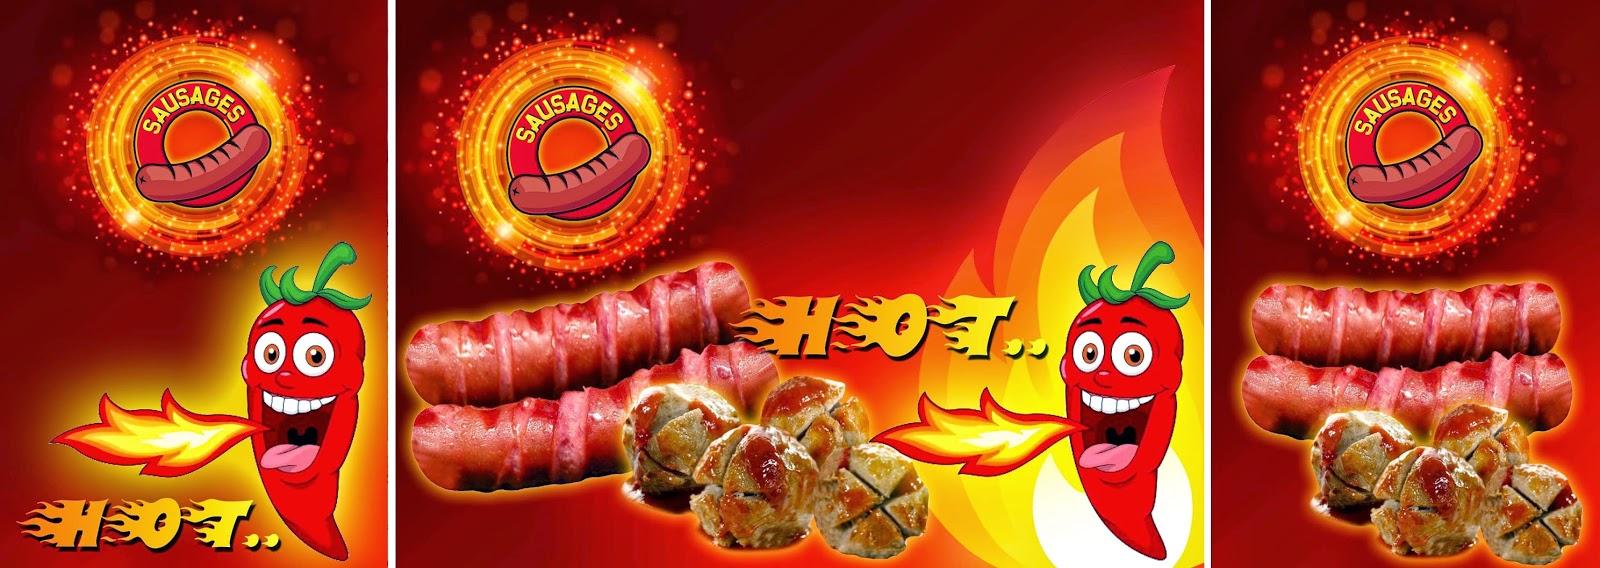 Contoh Banner Bakso - Hontoh